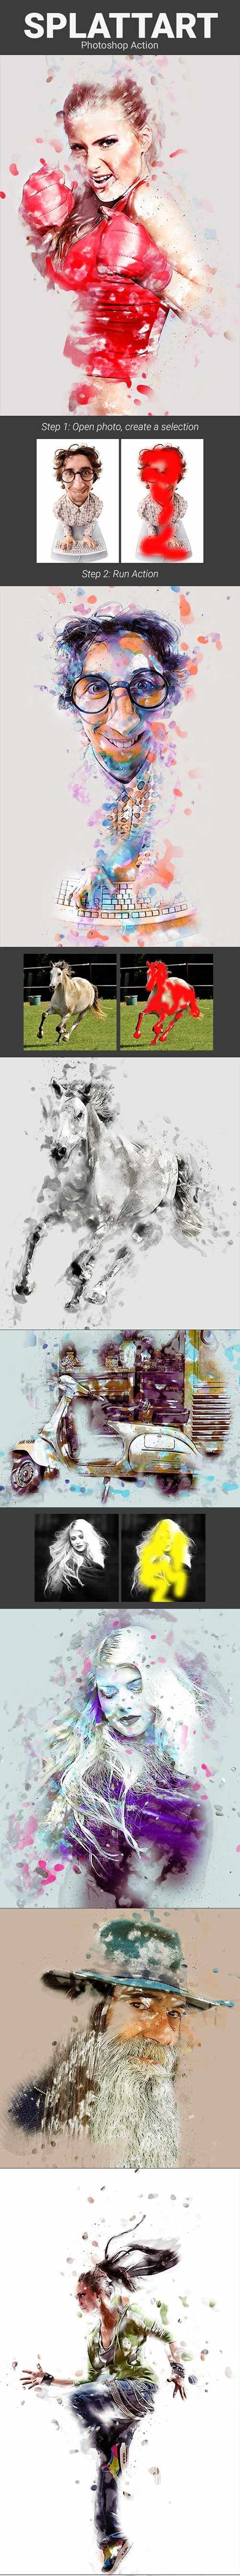 GraphicRiver - Splattart 22700717